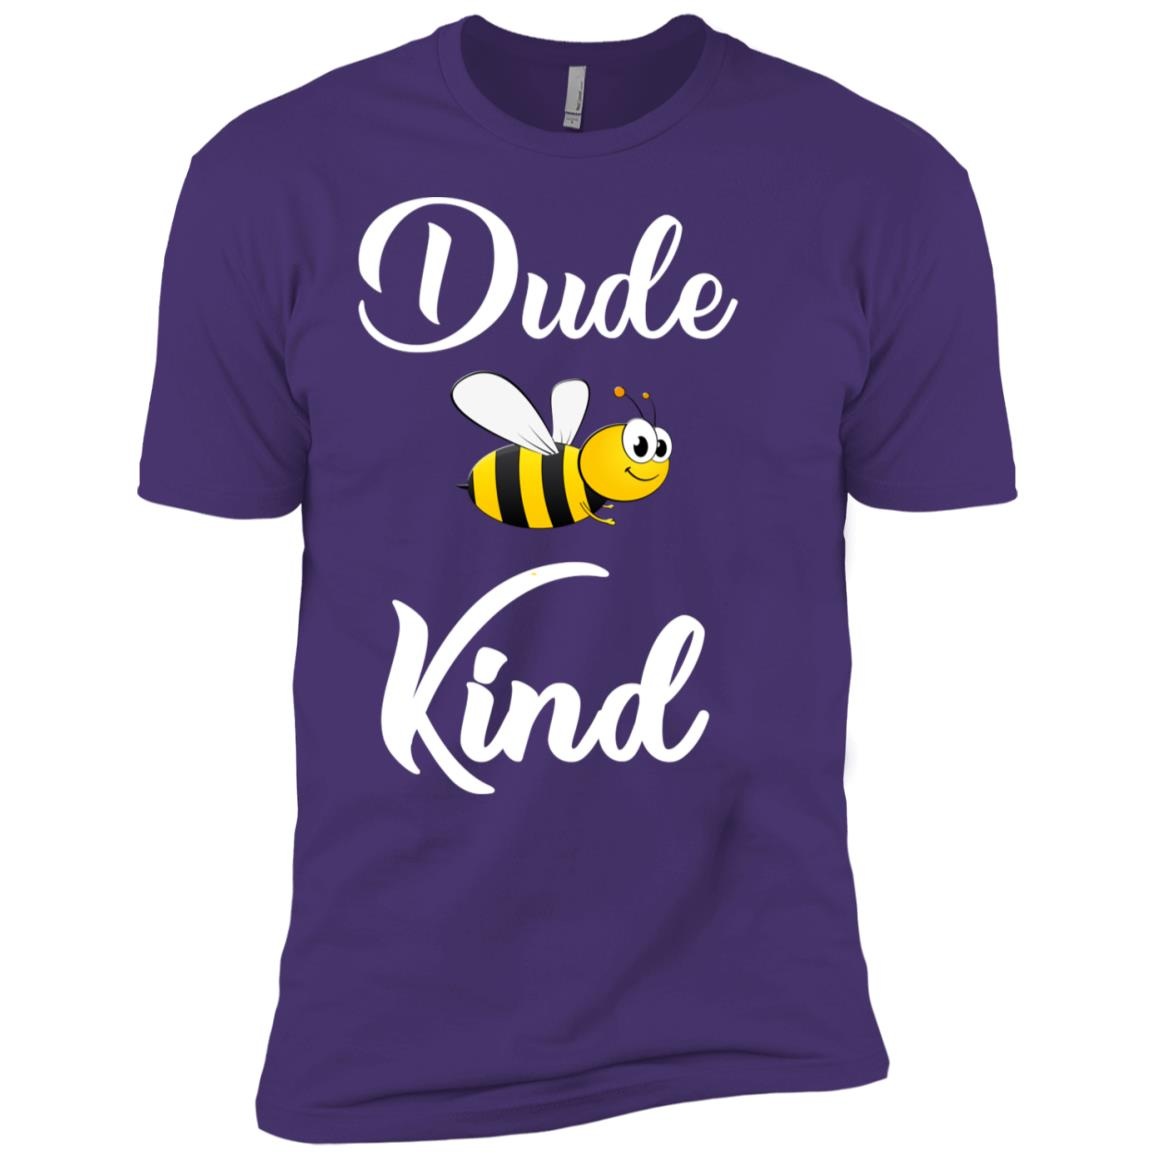 Dude be kind choose kindness anti bullying Long -1 Men Short Sleeve T-Shirt